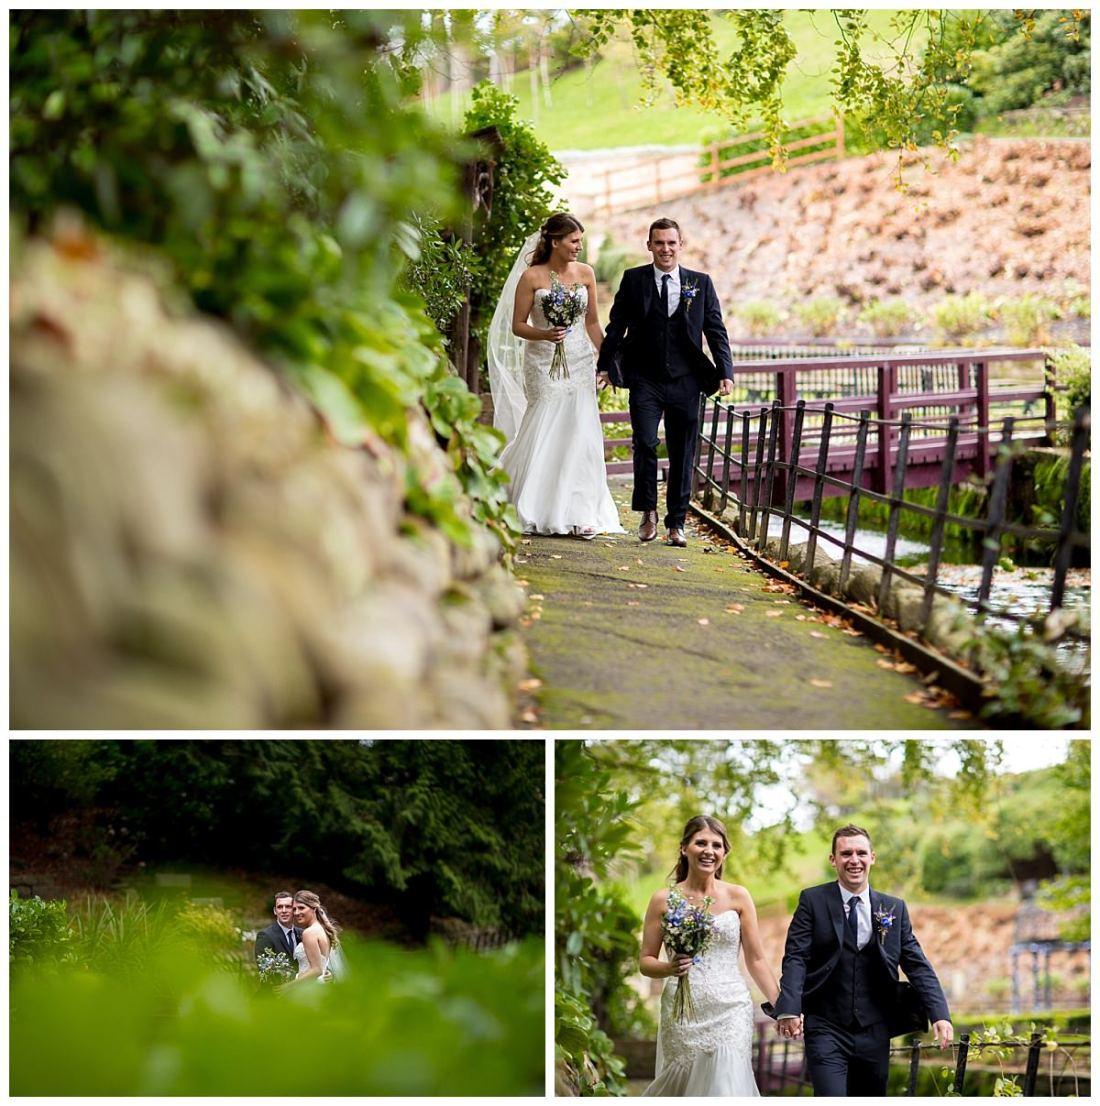 Bride and groom walking through the gardens at The Raithwaite Estate